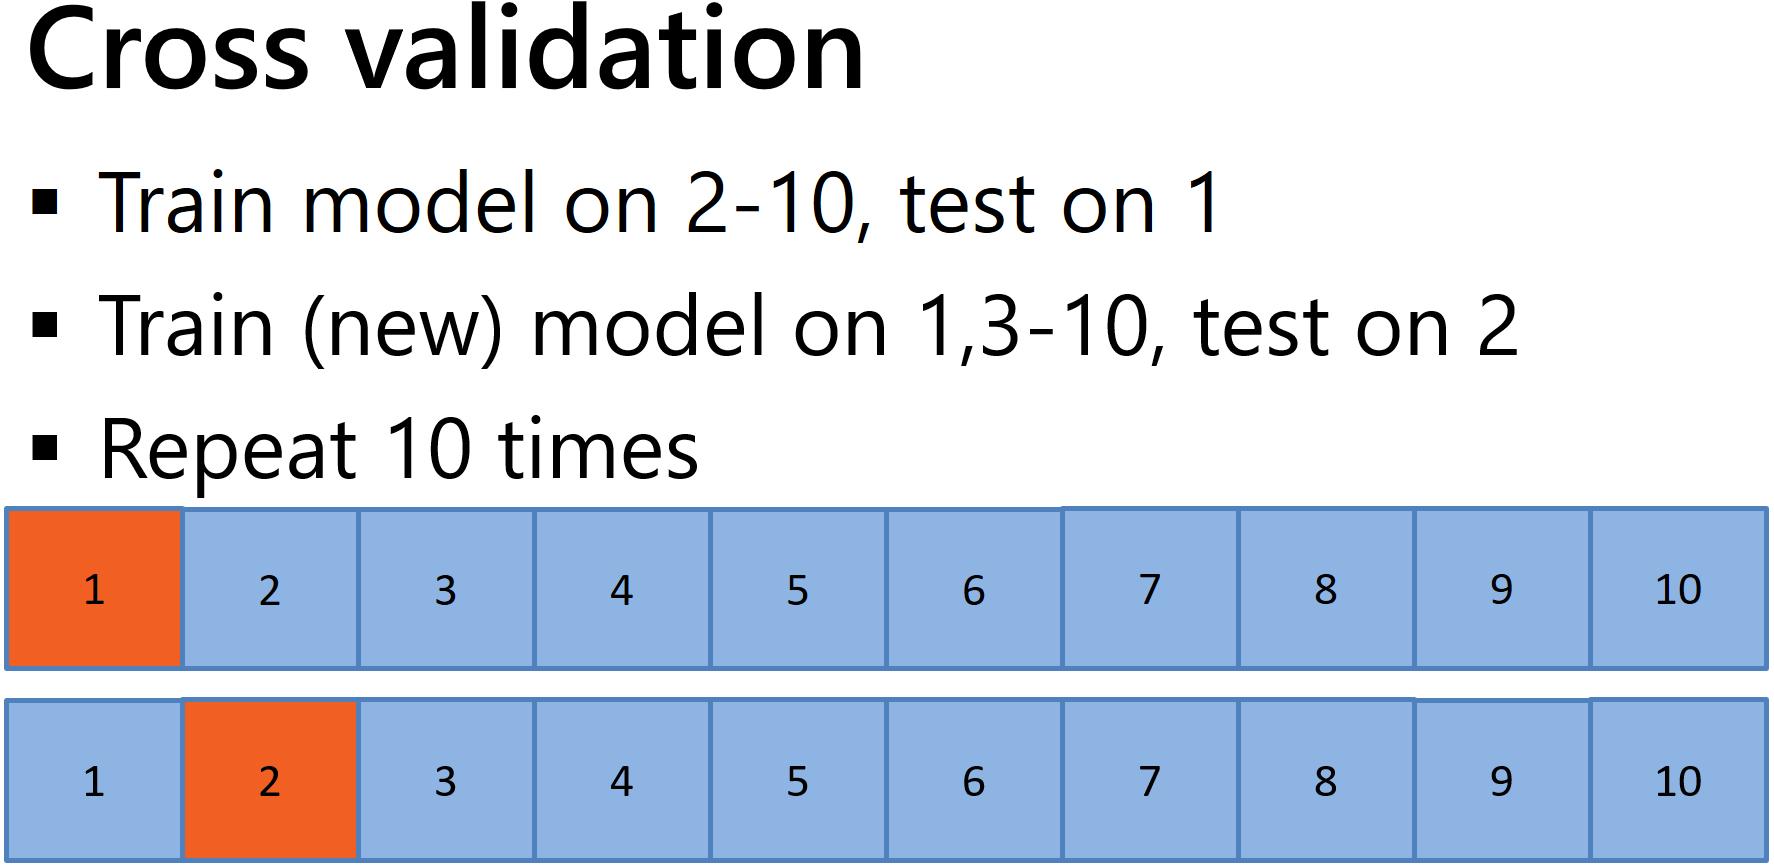 Model training and evaluation image Cross-validation